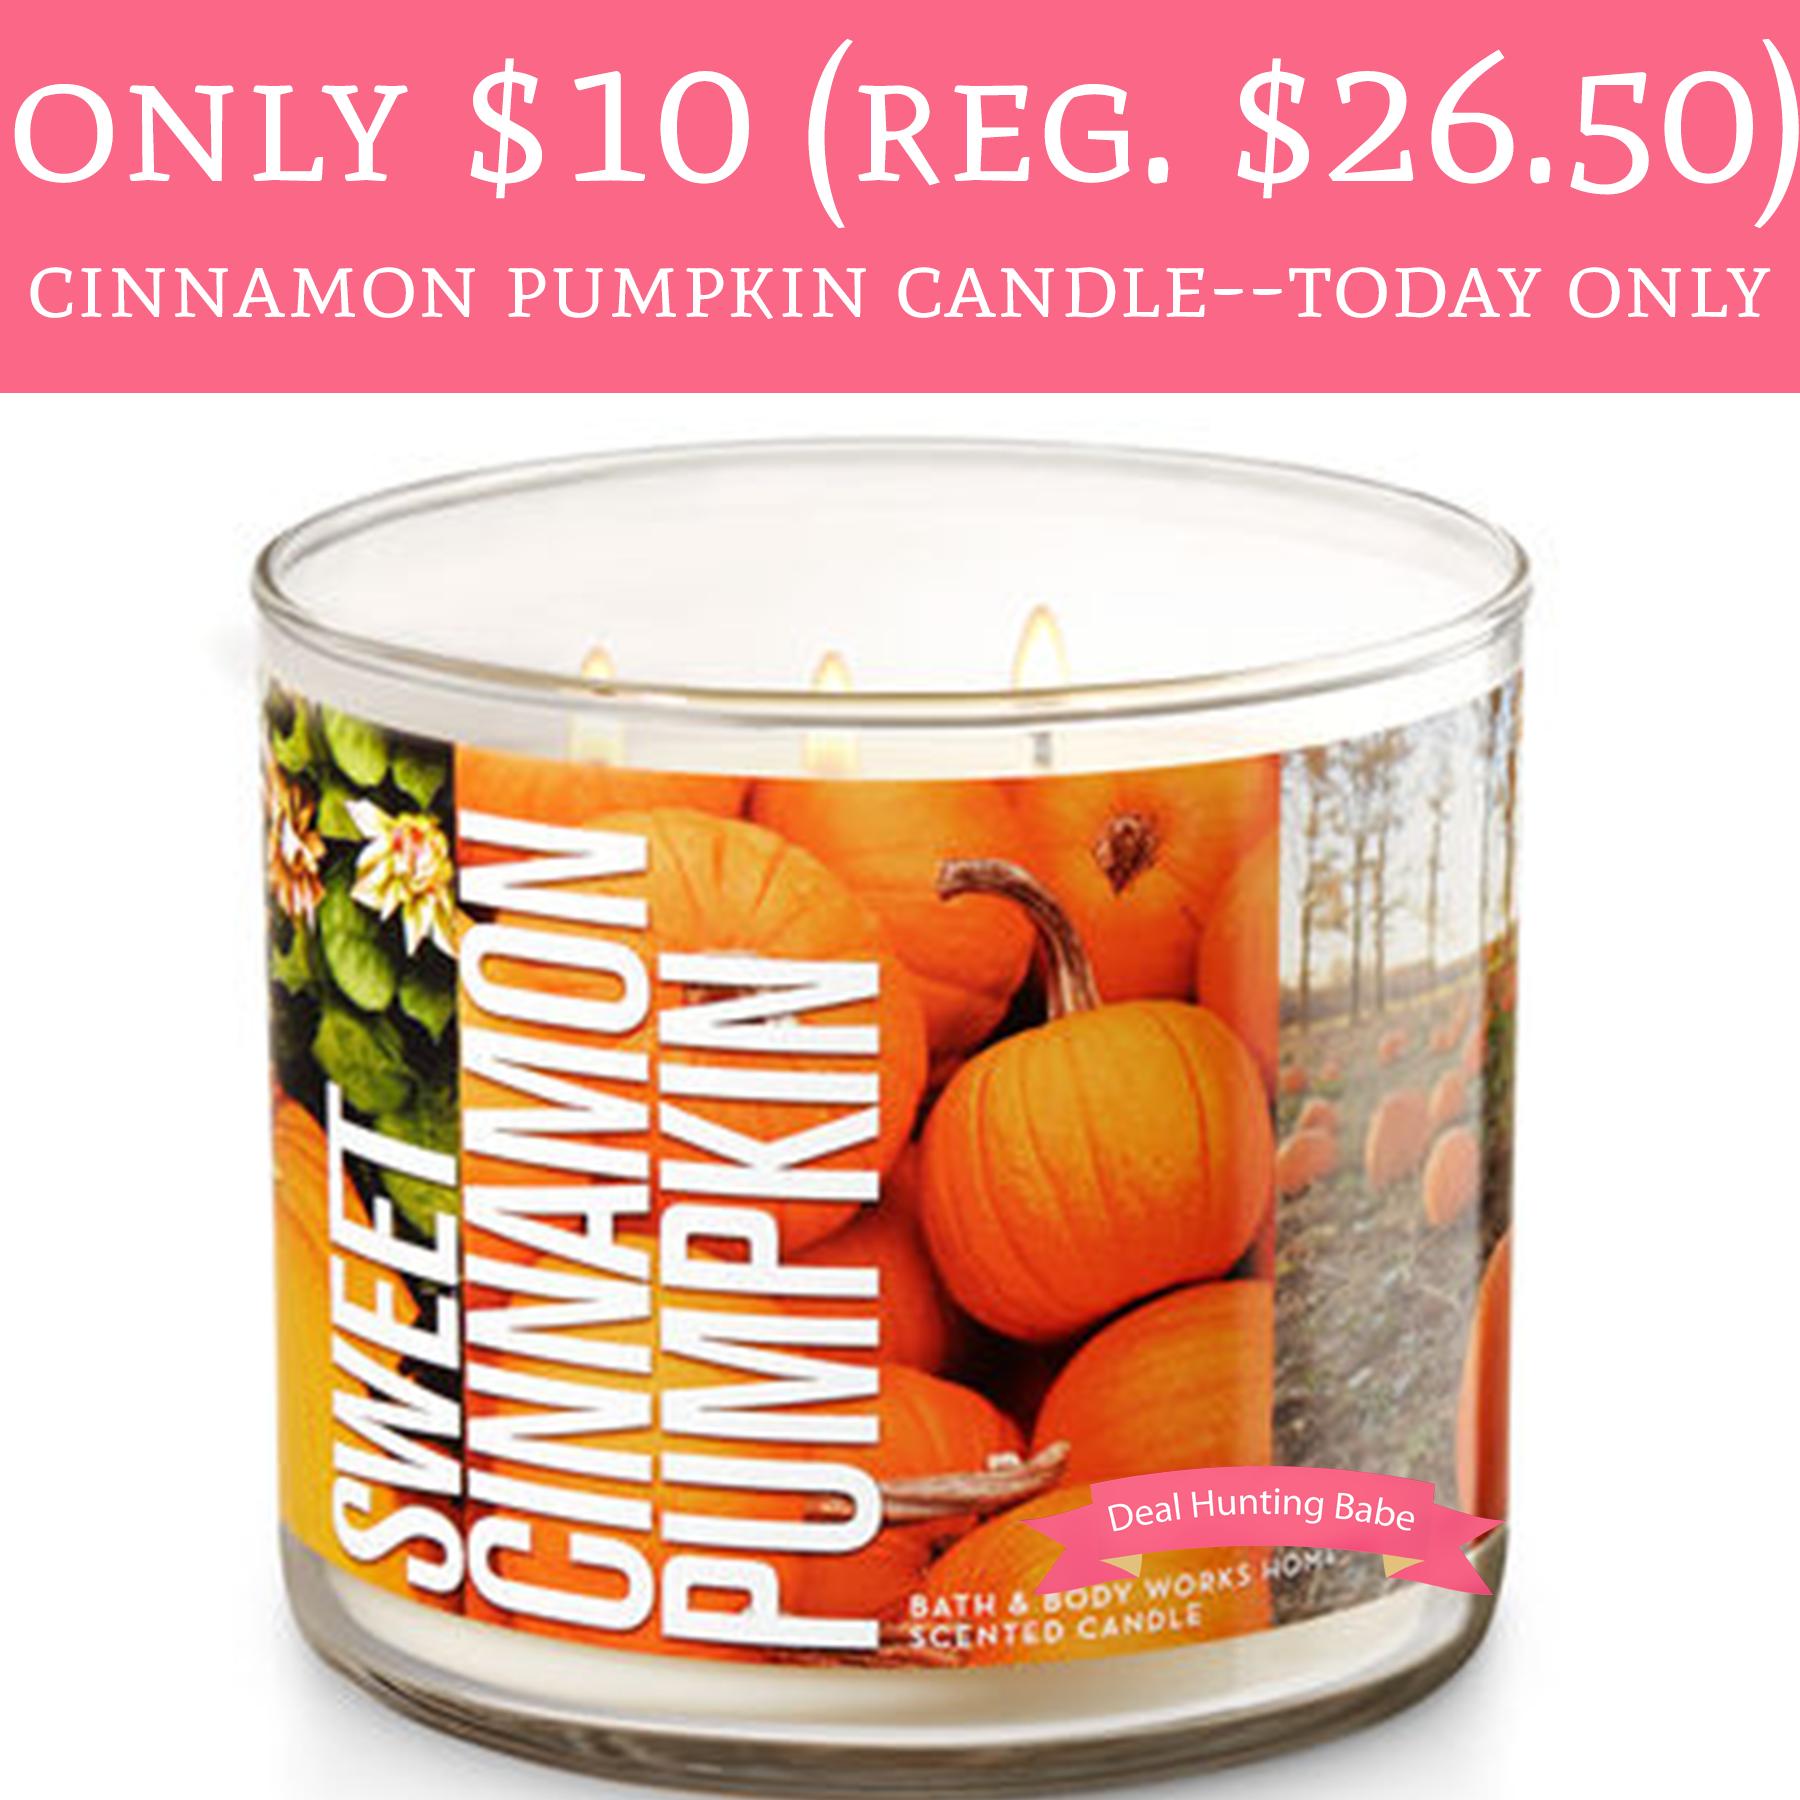 Only 10 Regular 2650 Sweet Cinnamon Pumpkin Candles At Bath And